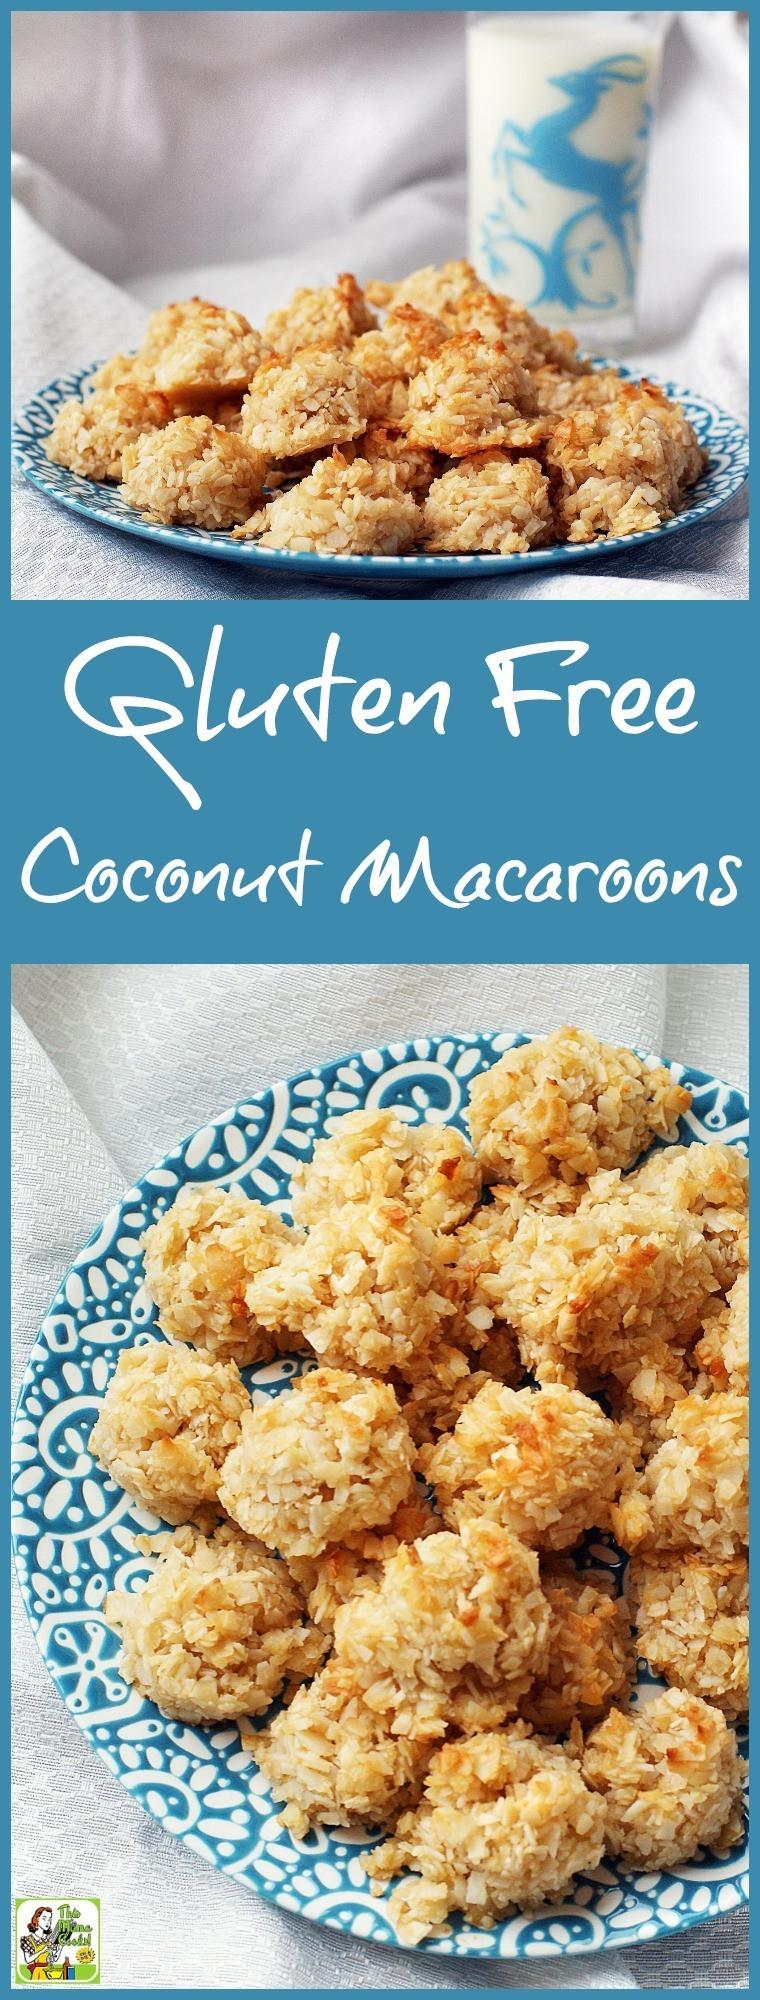 Dairy Free Coconut Macaroons  Gluten Free Coconut Macaroons